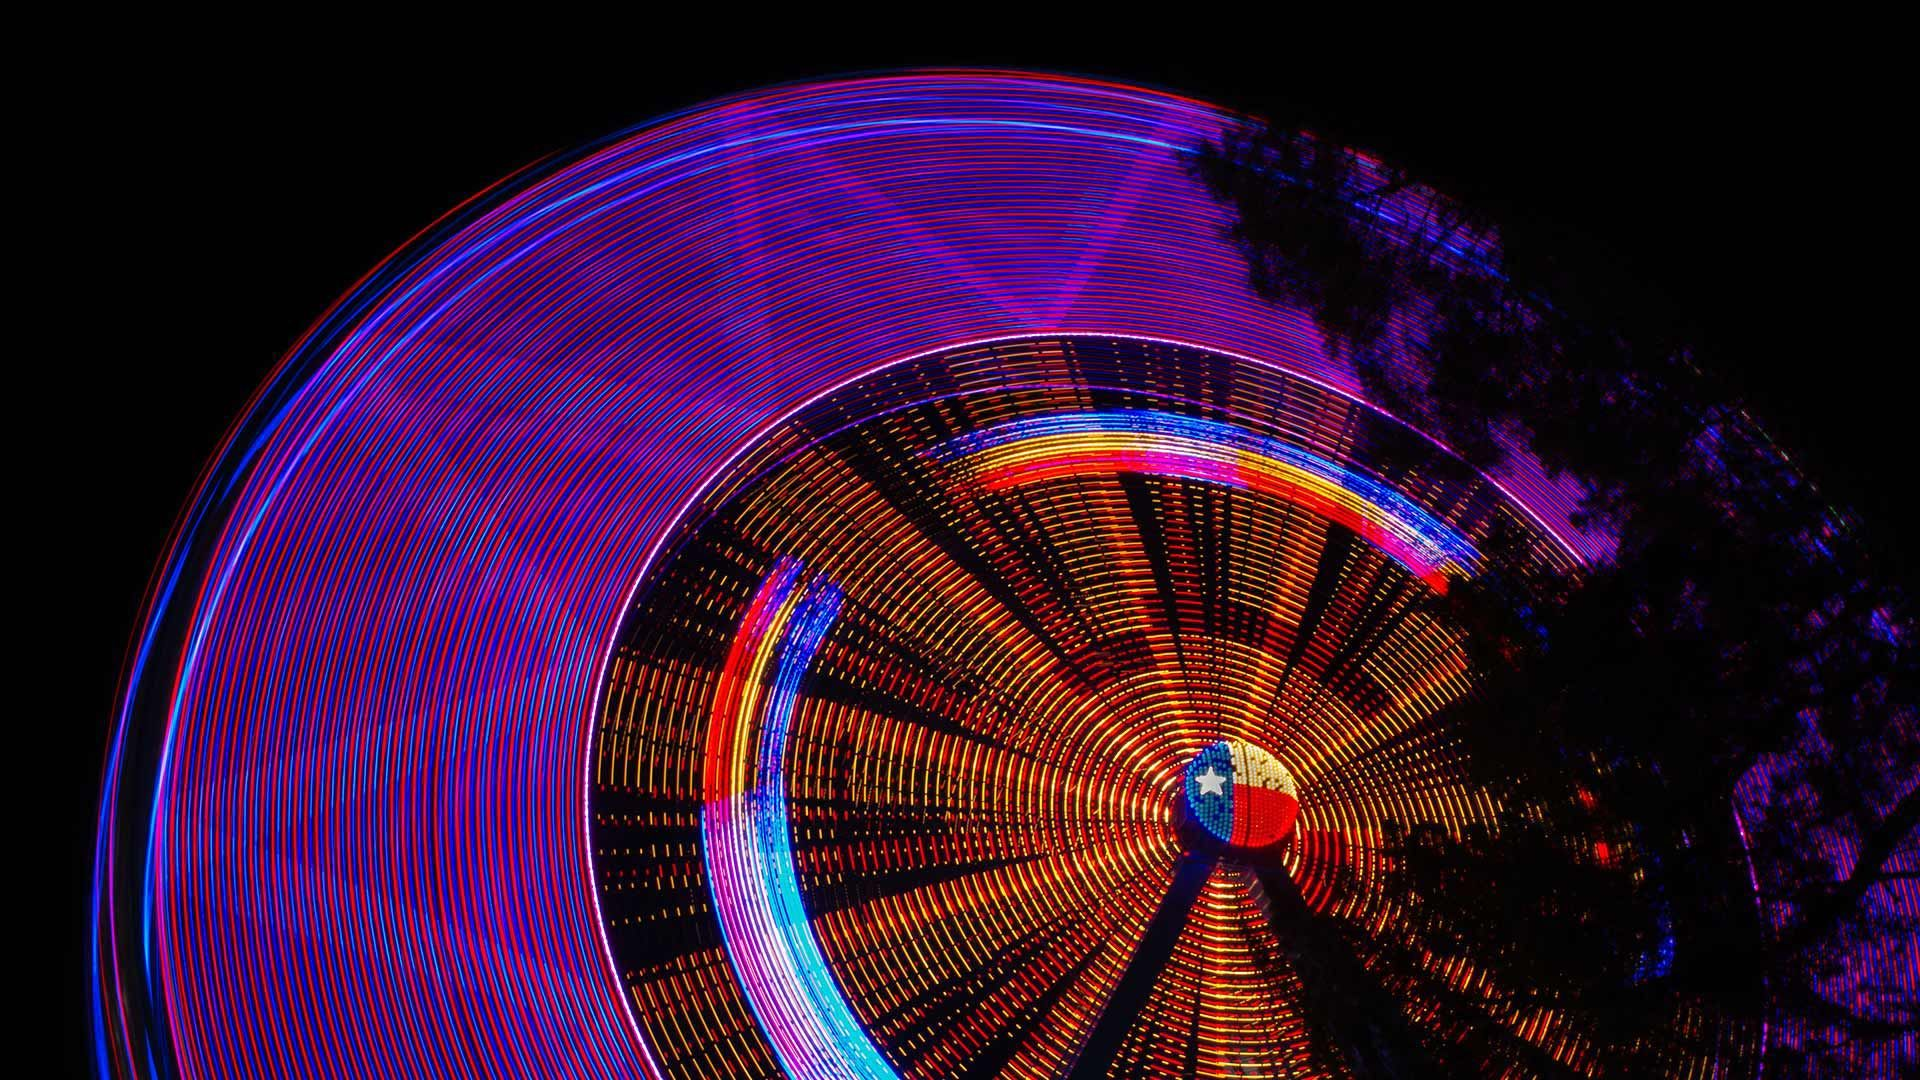 Texas Star, the Ferris wheel at the State Fair of Texas in Dallas